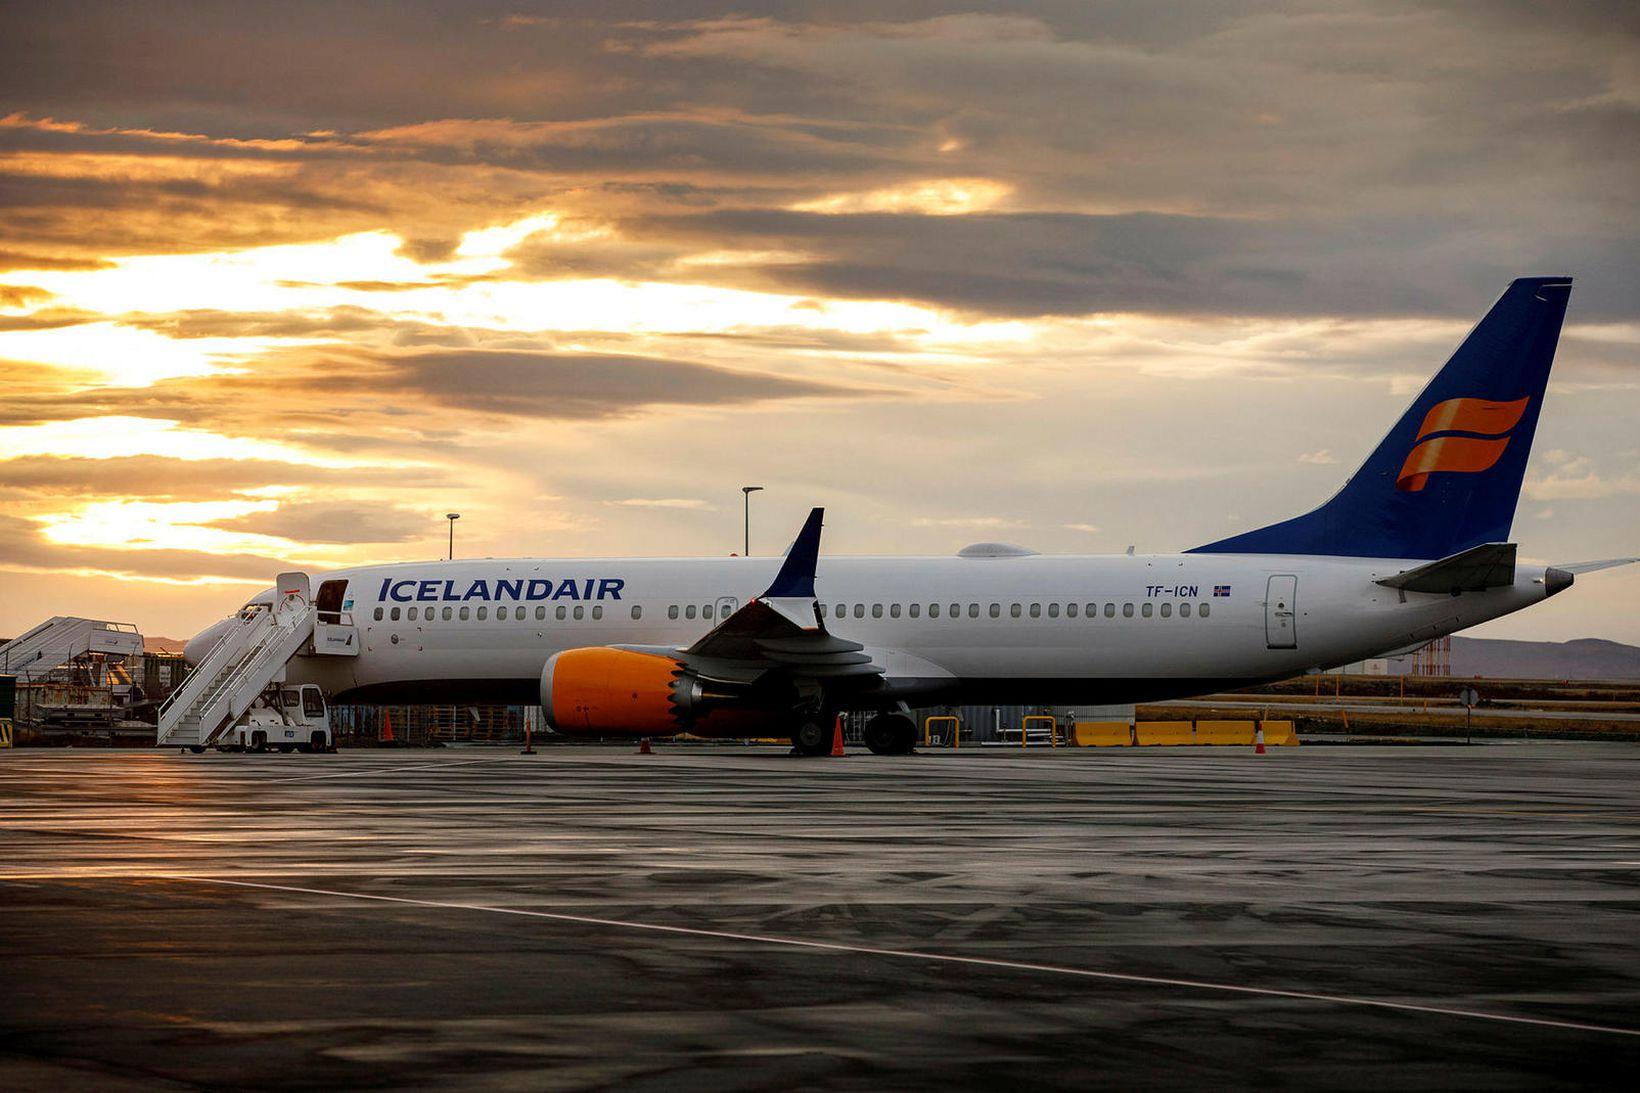 Ein af Boeing MAX 8 flugvélum Icelandair.